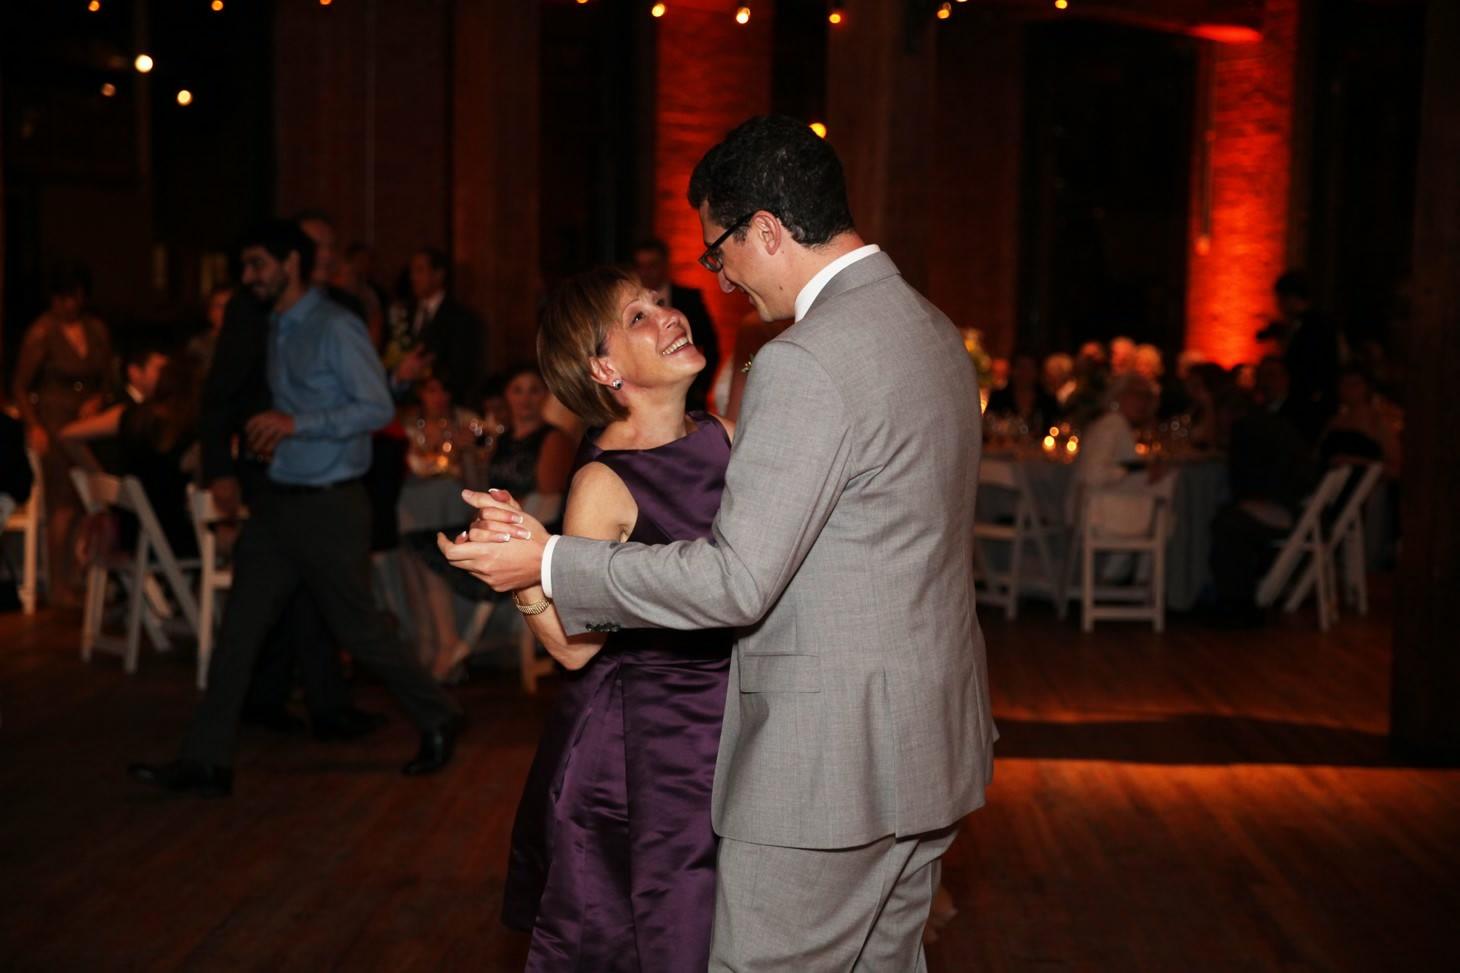 034-nyc-dumbo-loft-brooklyn-wedding-photographer-smitten-chickens-photo-.jpg